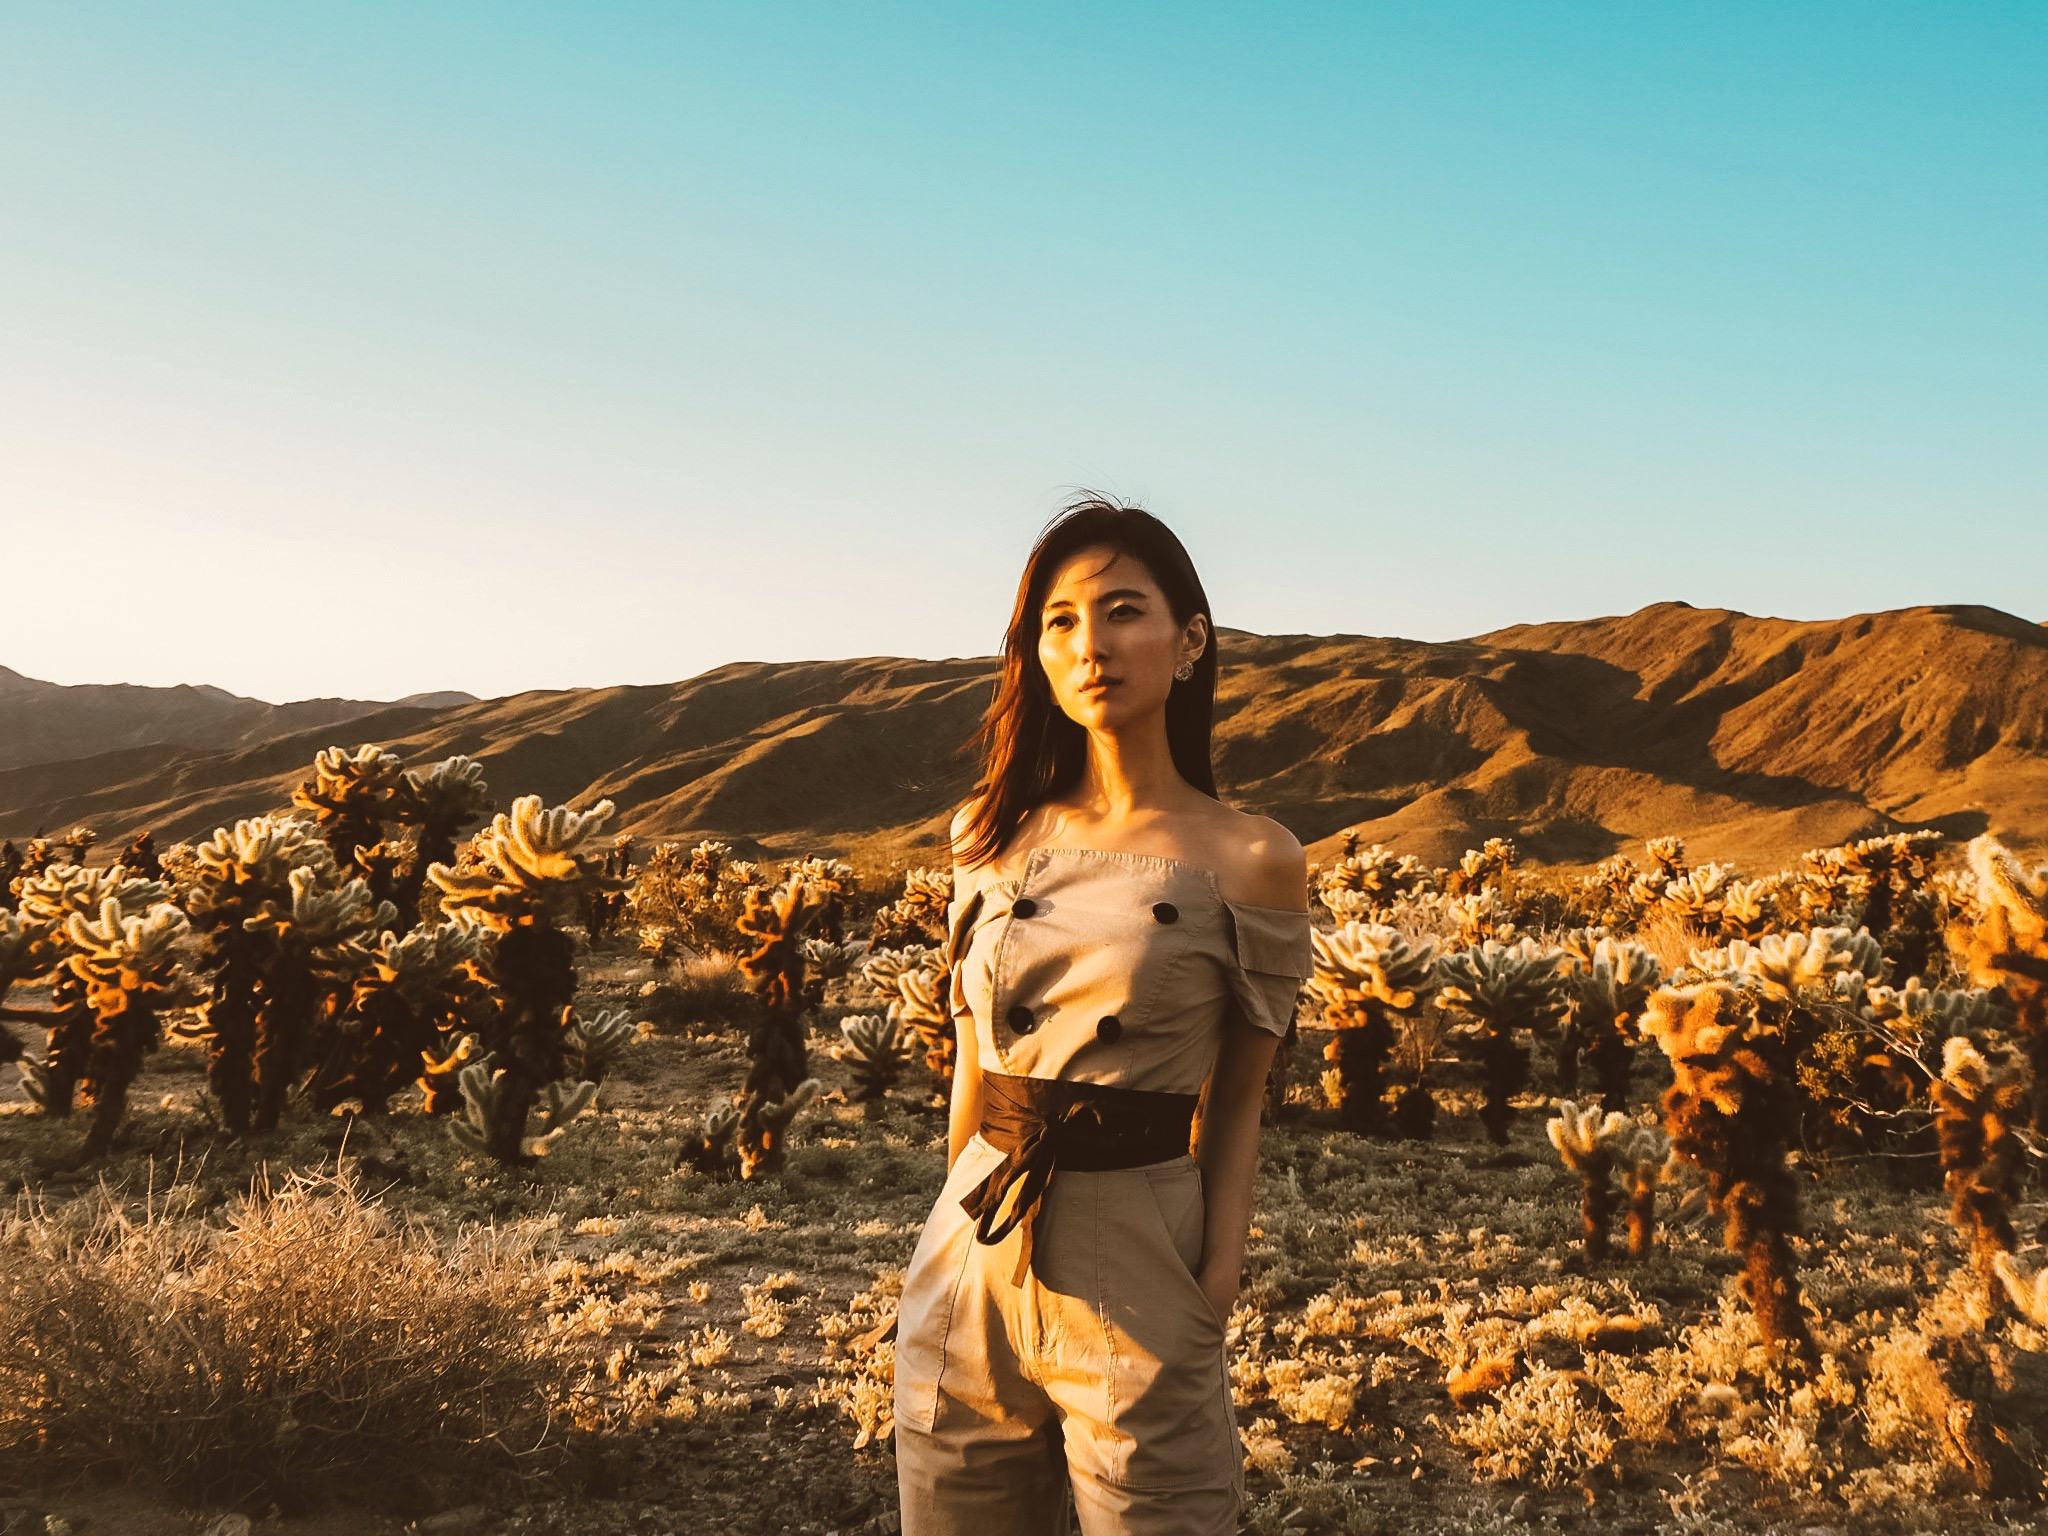 Joshua Tree National Park — Adventures of Peony self improvement